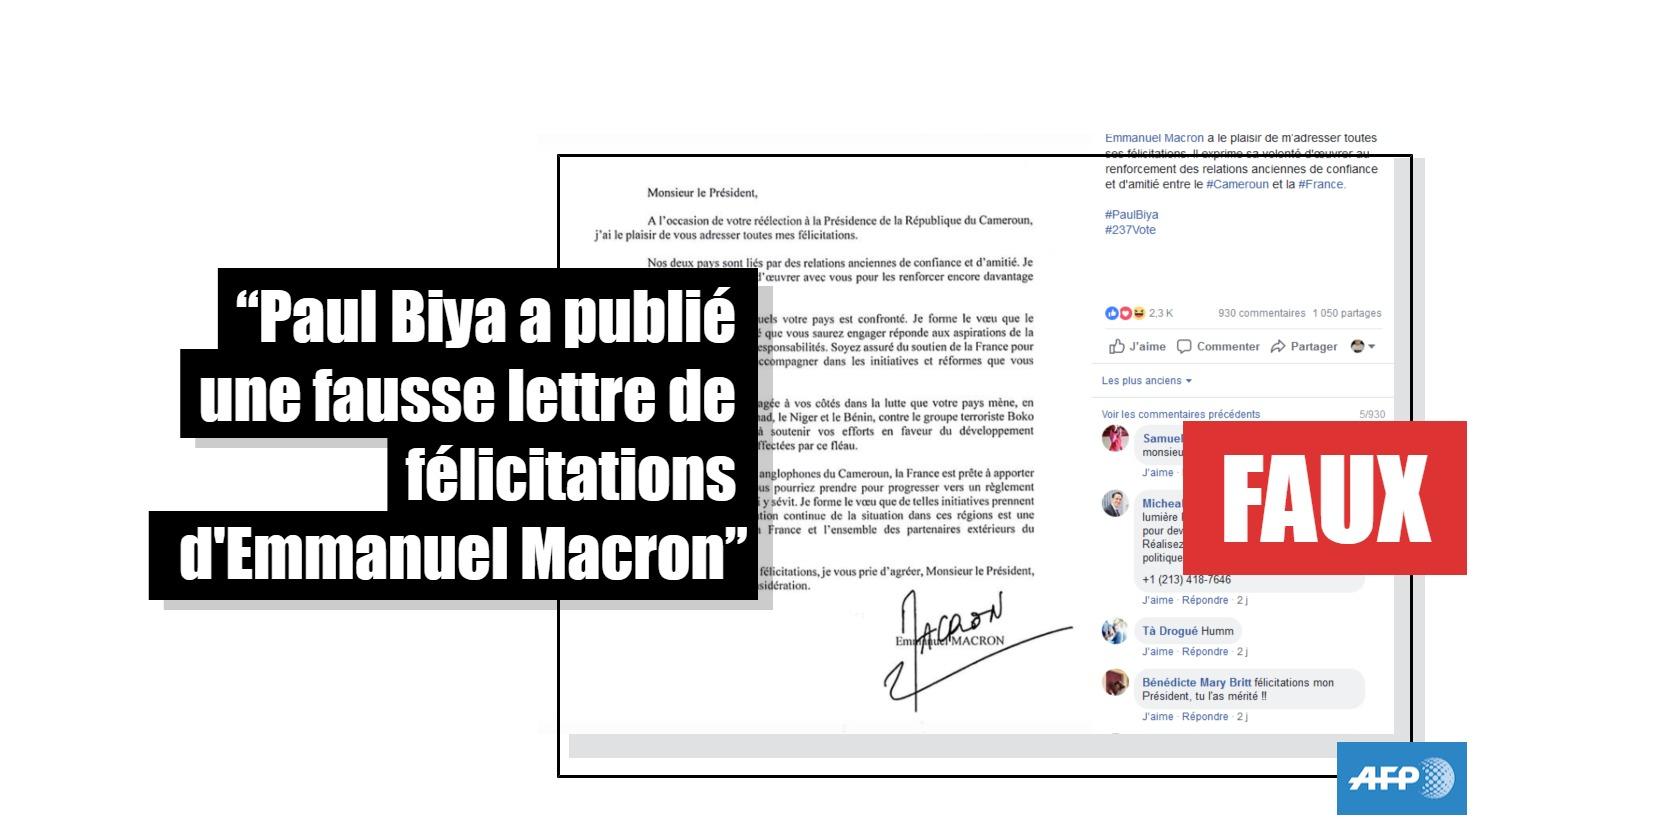 Capture d'écran du compte Facebook du président camerounais Paul Biya